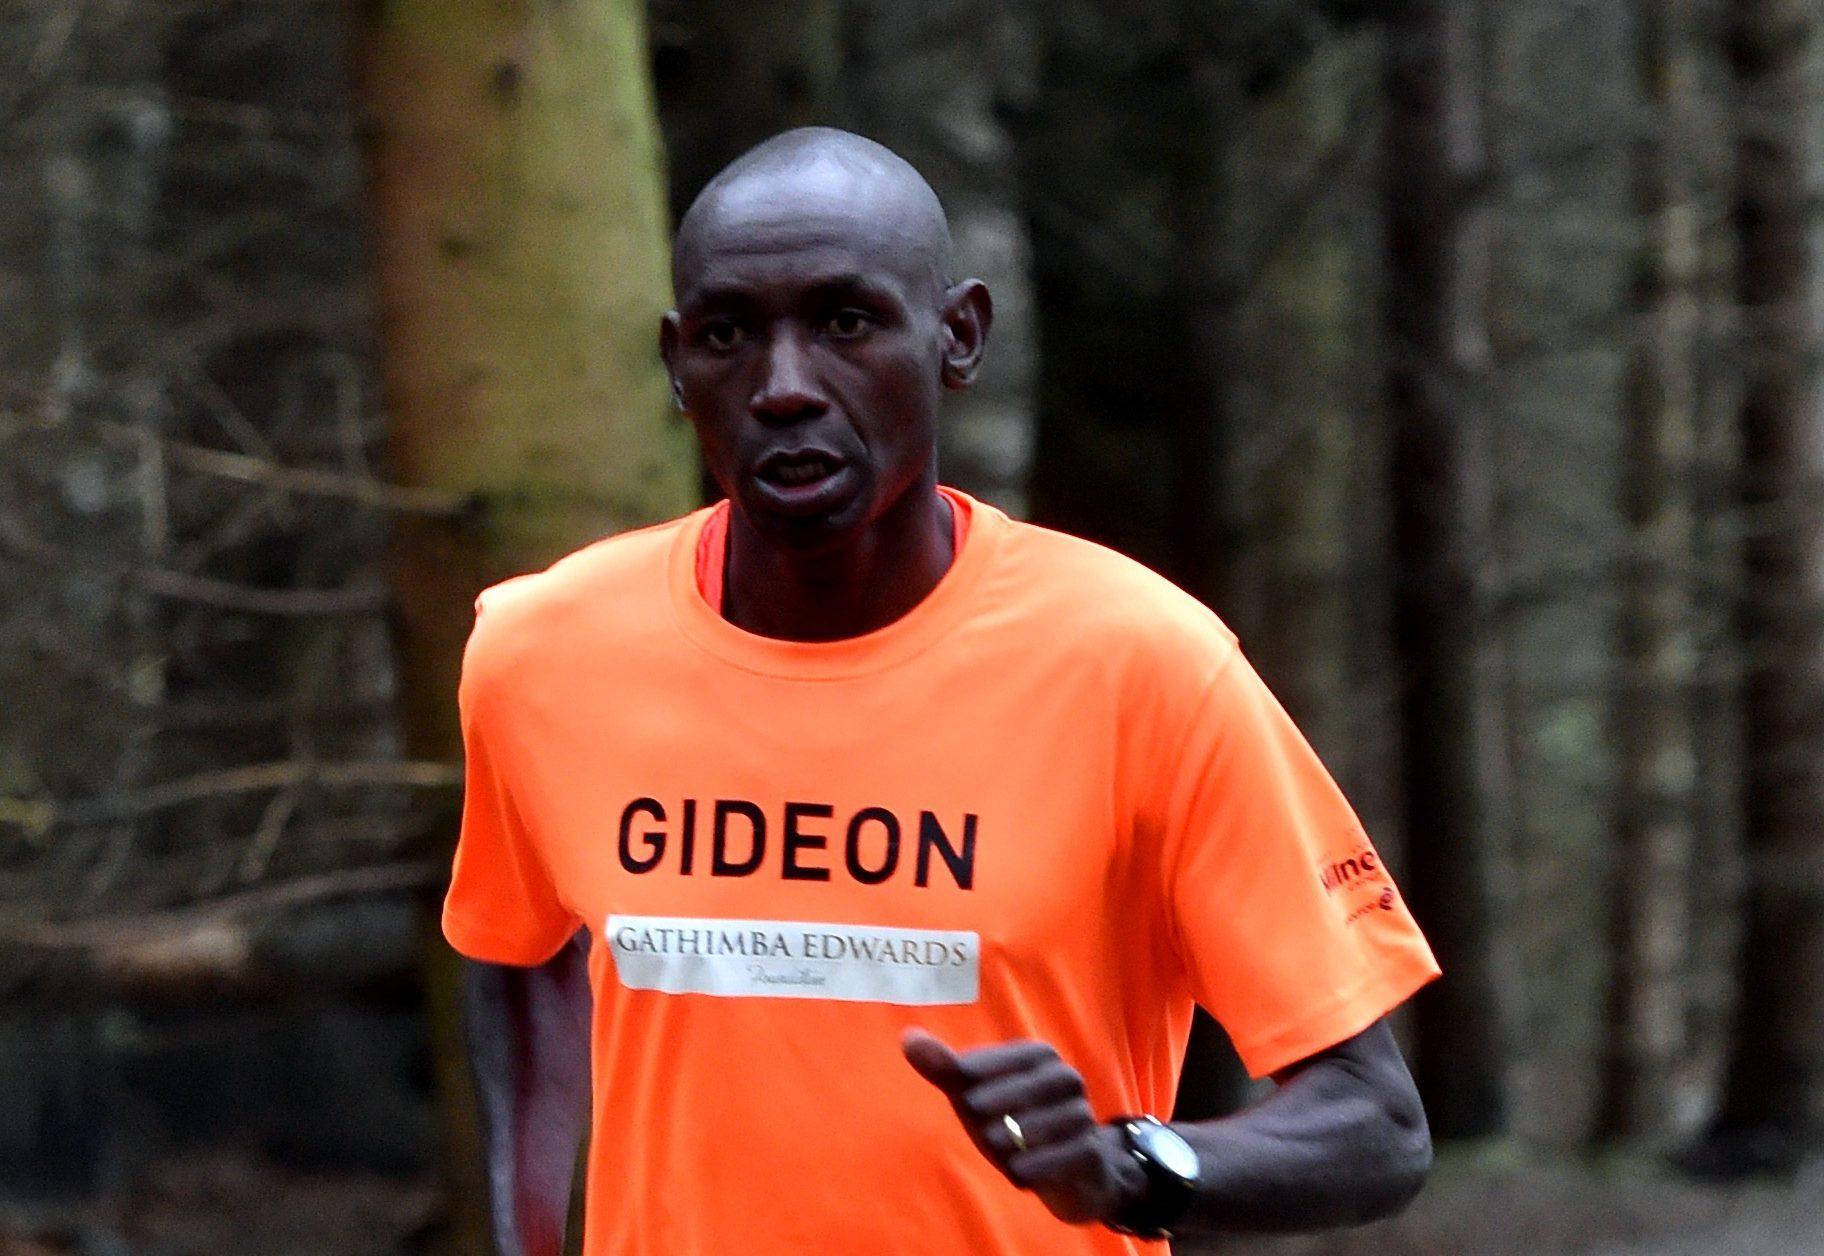 Gideon Gathimba   recorded a time of 14min 48secs in the Hazlehead park run 5km.